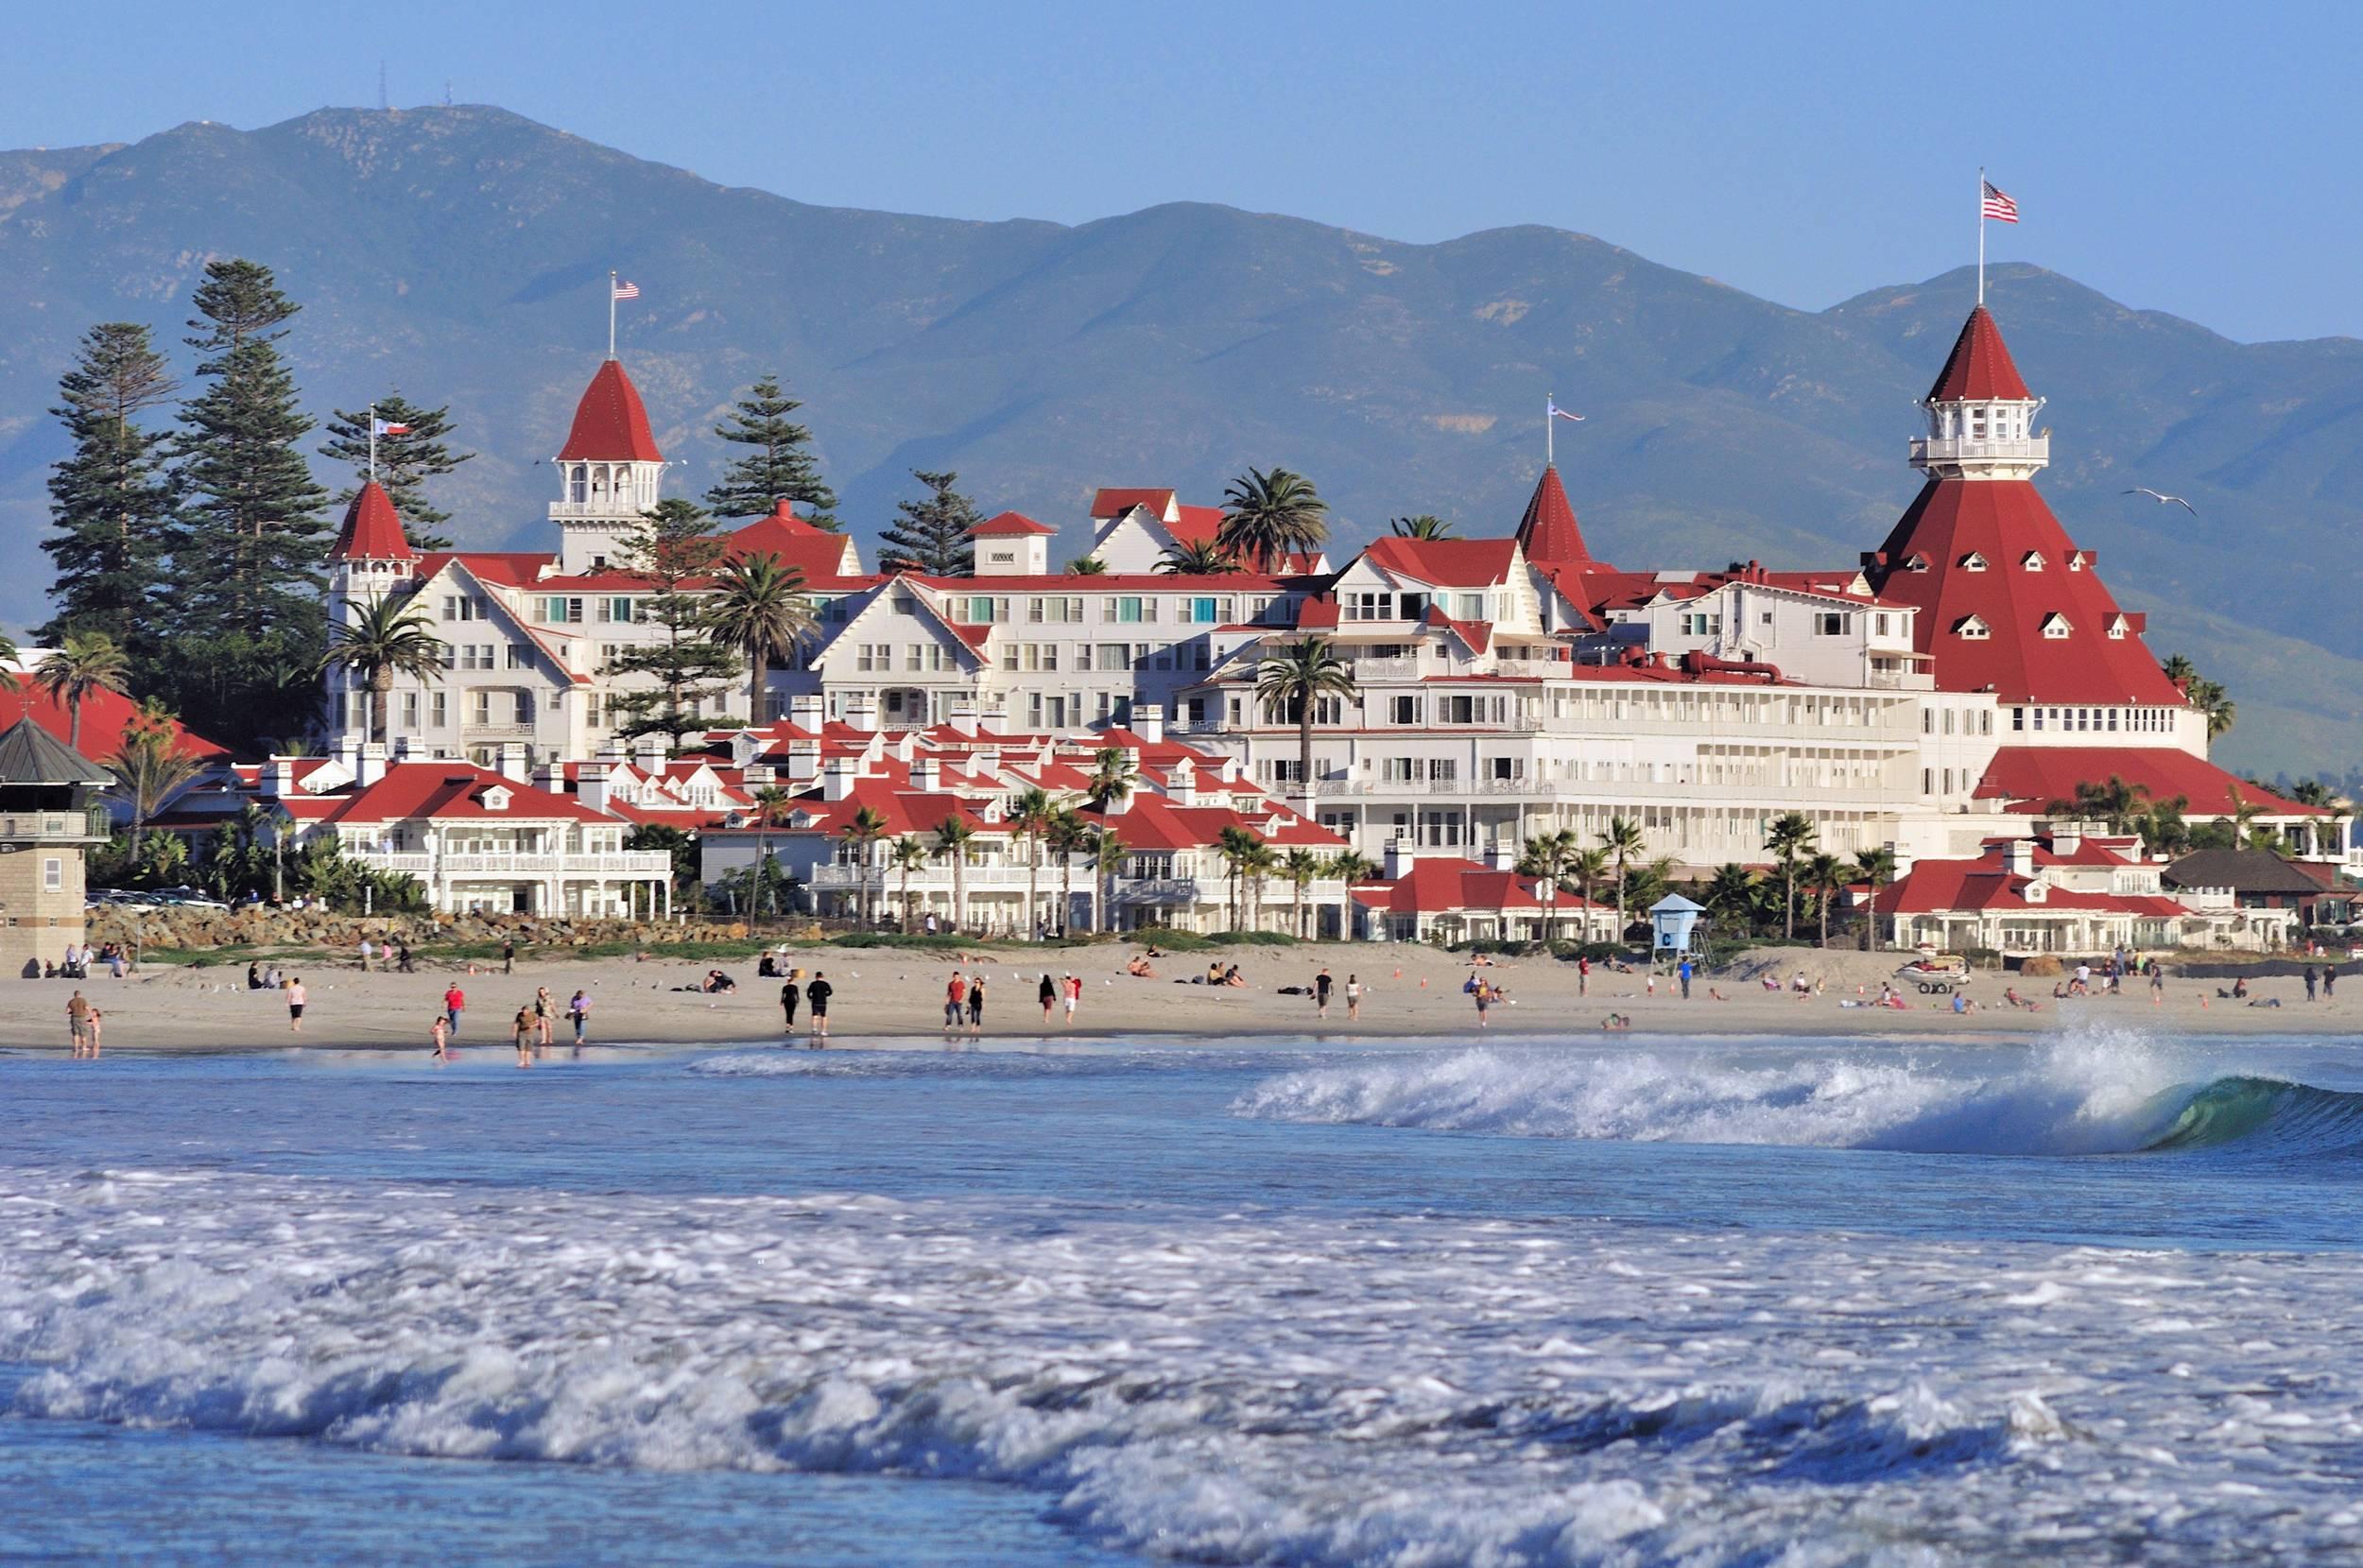 #1 U.S. Beach